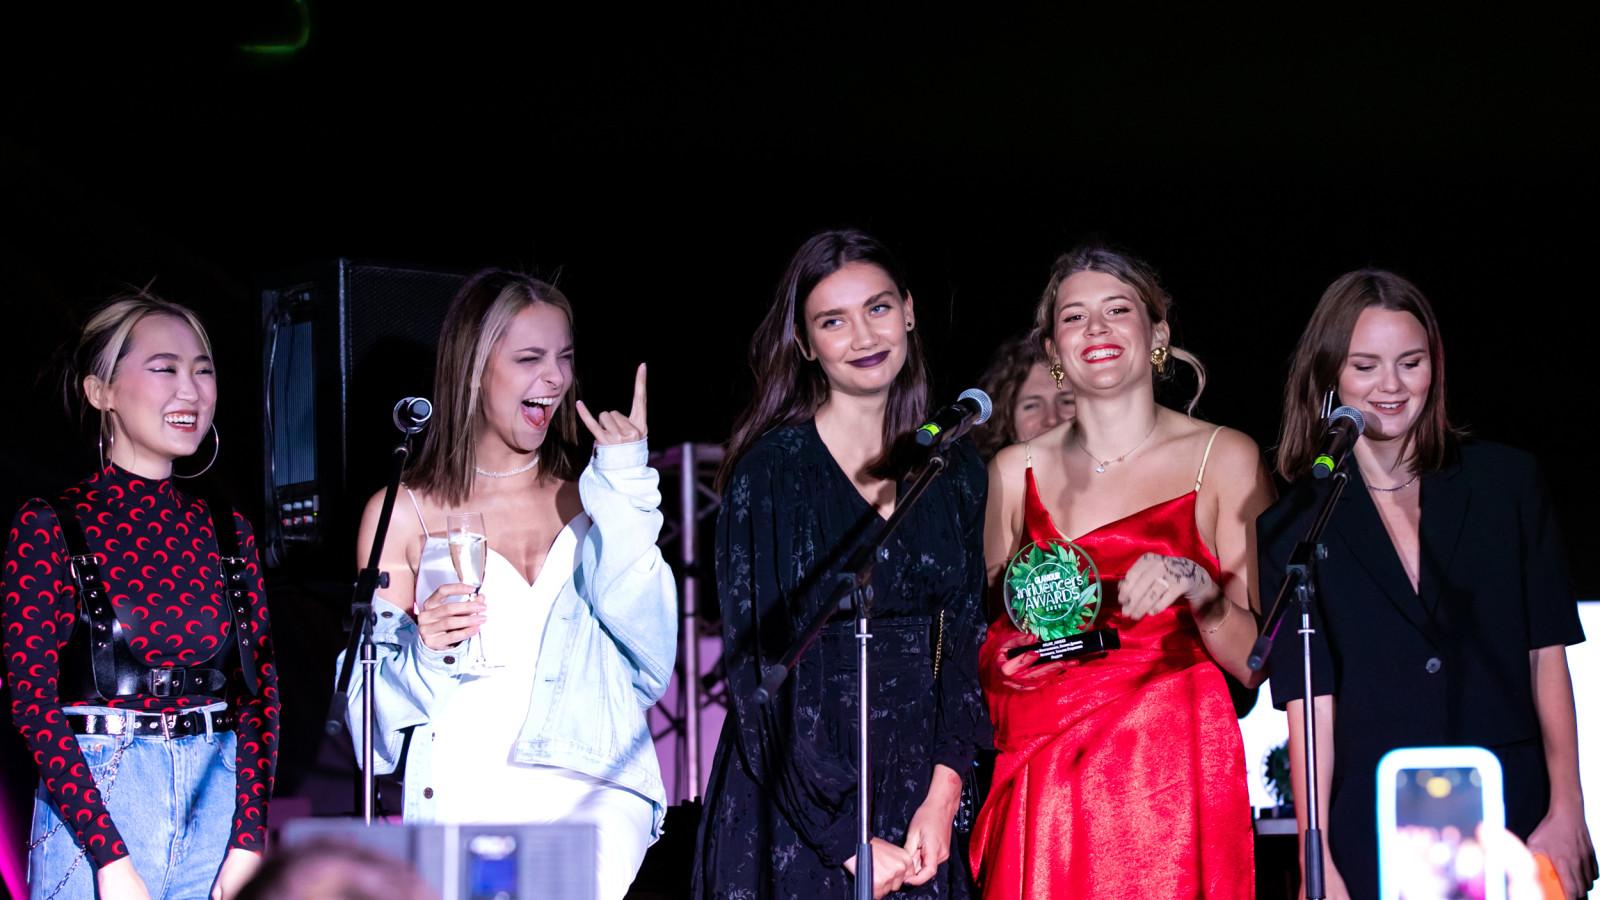 803A9031 - Maria Pertseva-Khvaley - Russia - Glamour Influencers Awards